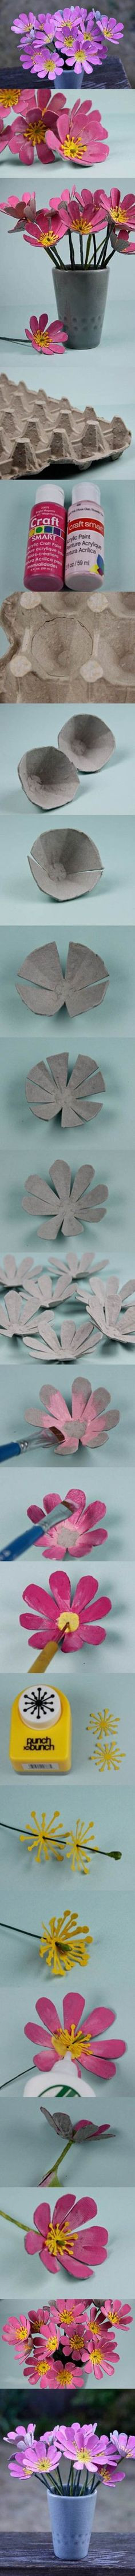 Egg Carton Craft – Butterfly Flowers